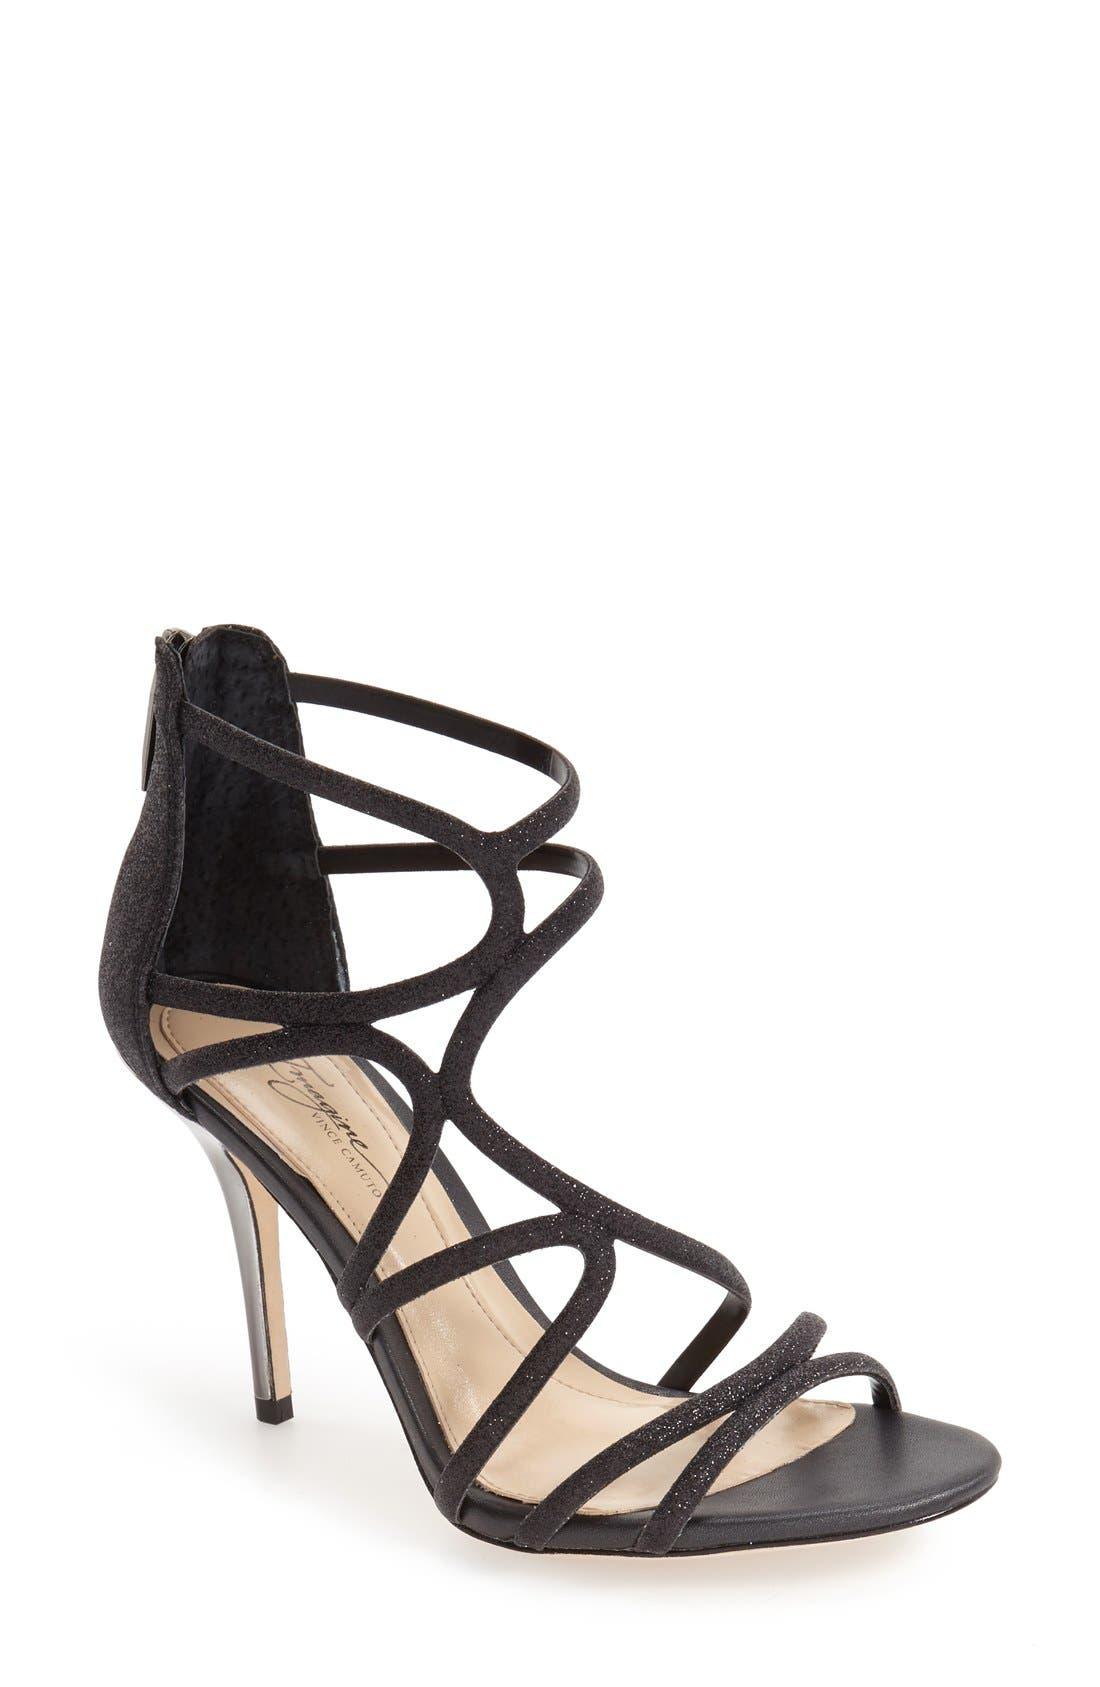 Imagine by Vince Camuto 'Ranee' Dress Sandal (Women)